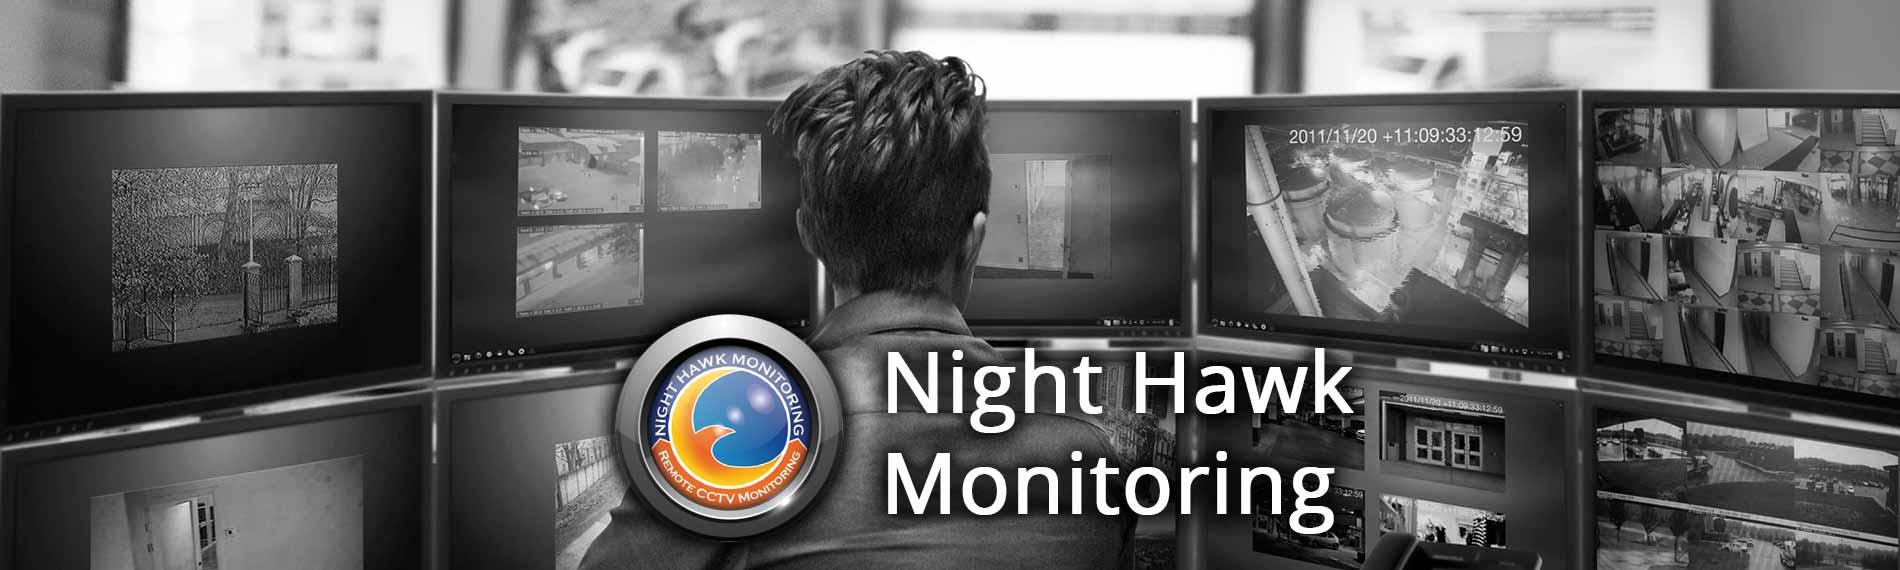 video surveillance cameras Florida, security cameras monitoring Florida, remote security monitoring Florida, REMOTE VIDEO SURVEILLANCE SECURITY CAMERAs MONITORING SYSTEM SERVICES COMPANY